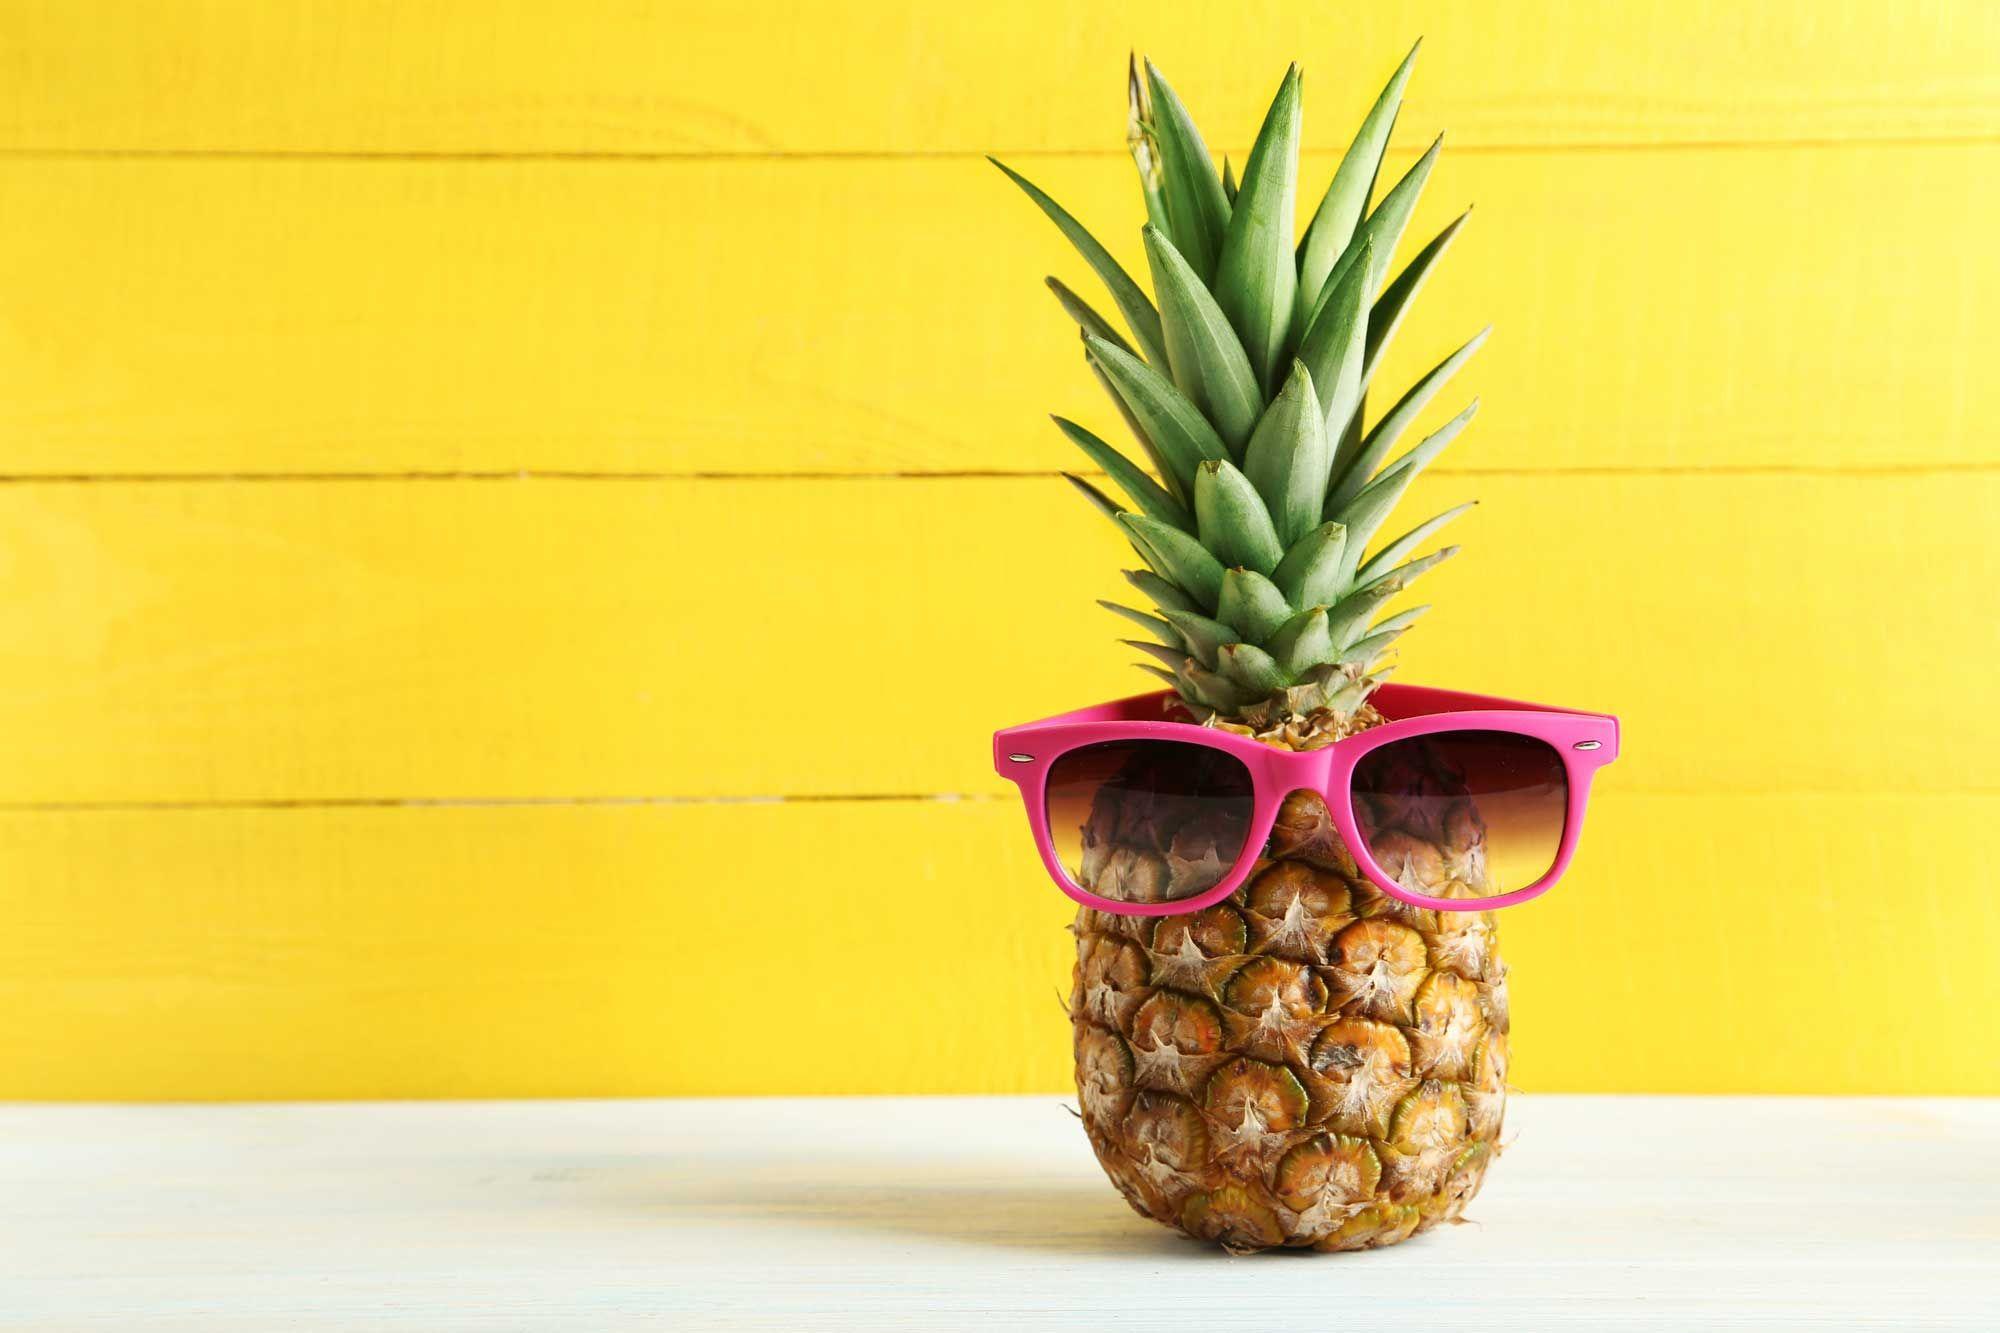 Cool Pineapple Sunglasses Wallpaper Desktop | Wallpaper | Pineapple, Ripe pineapple, Pineapple pizza